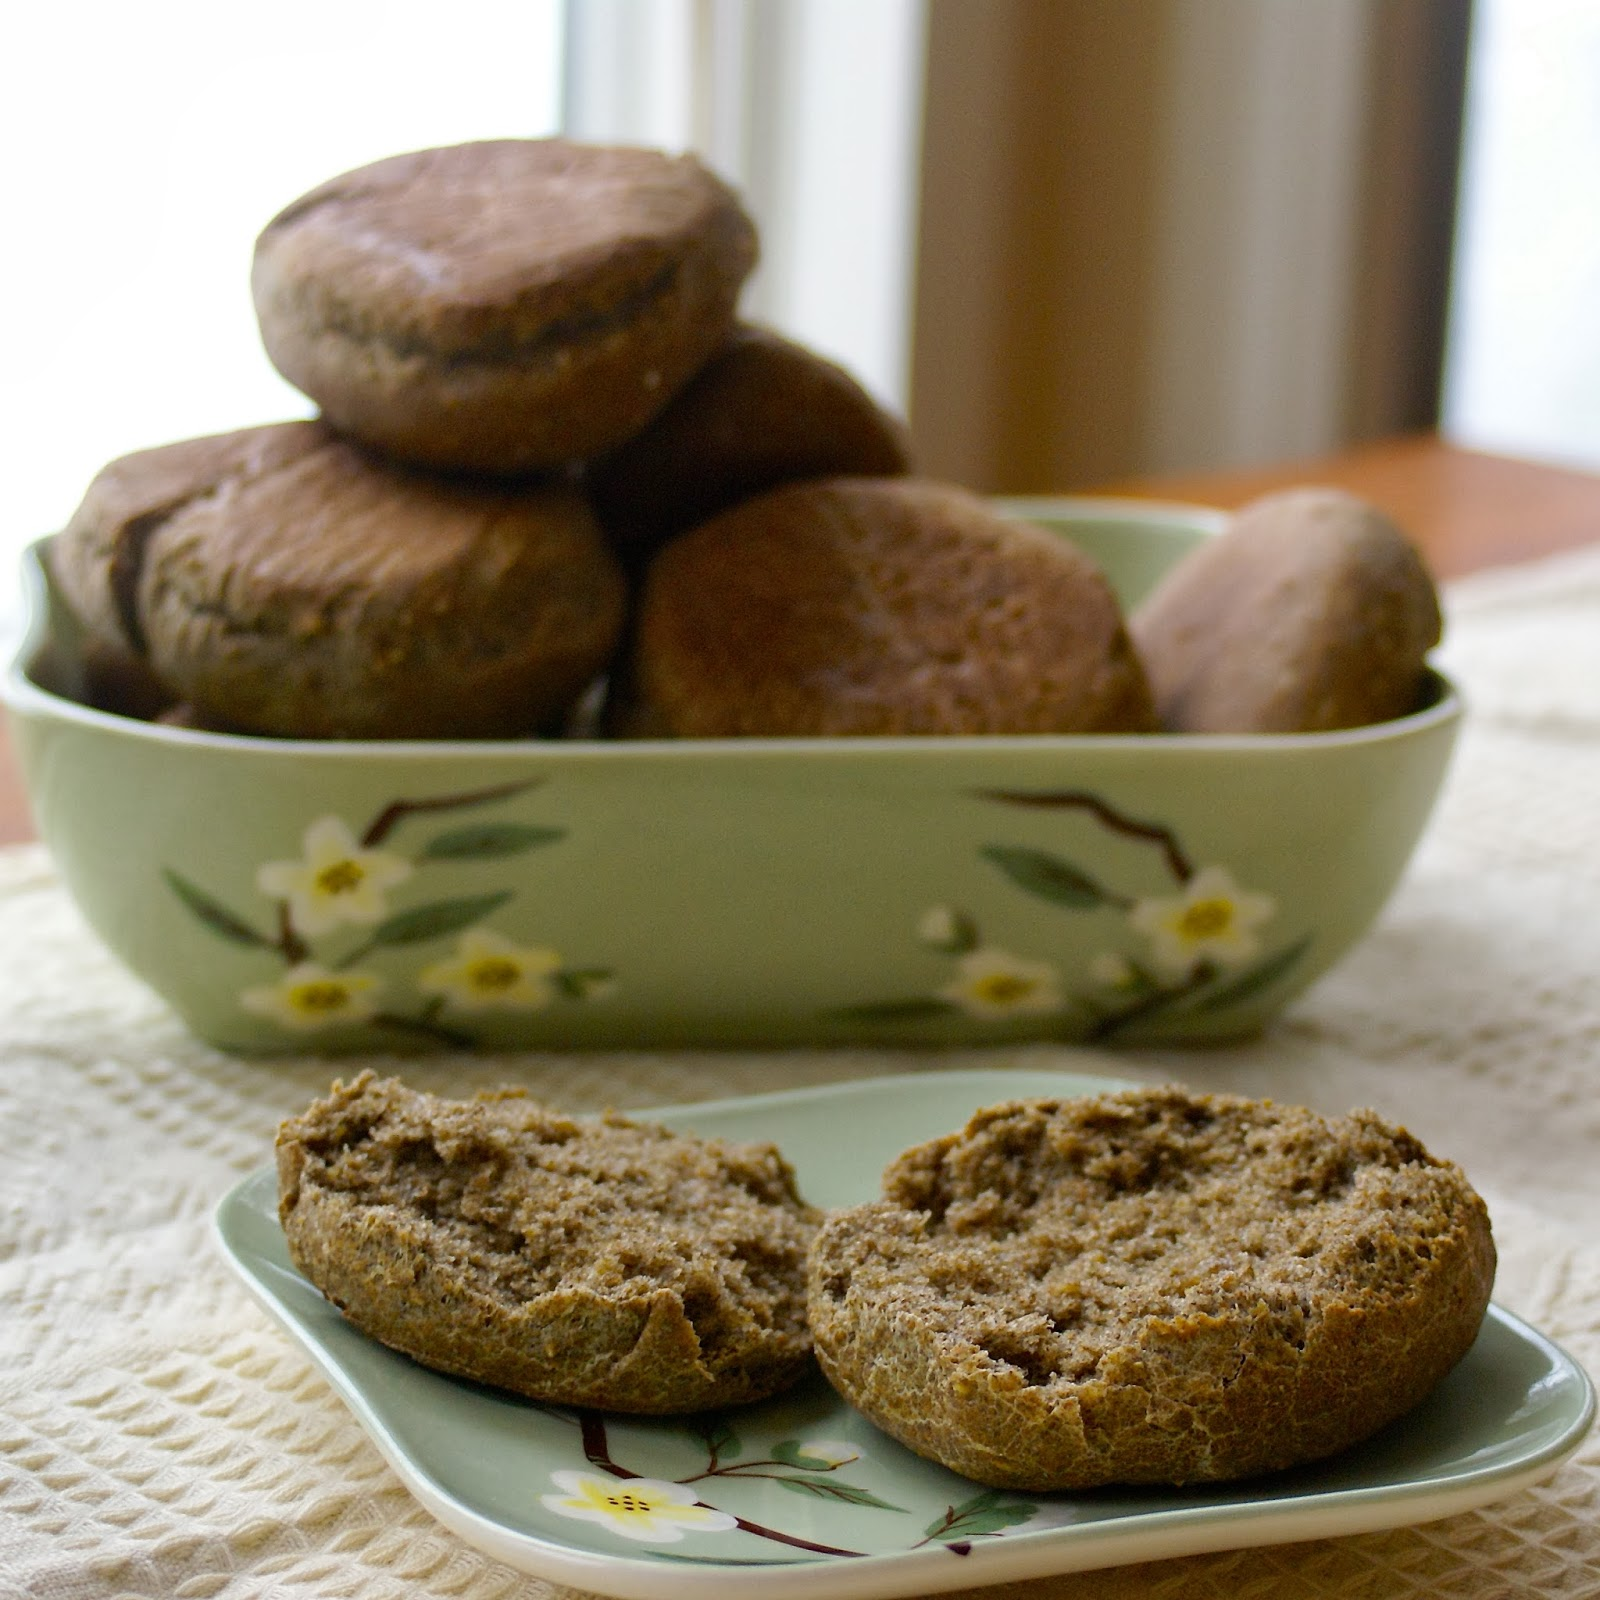 Margaret's Dish: Multi-Grain English Muffins